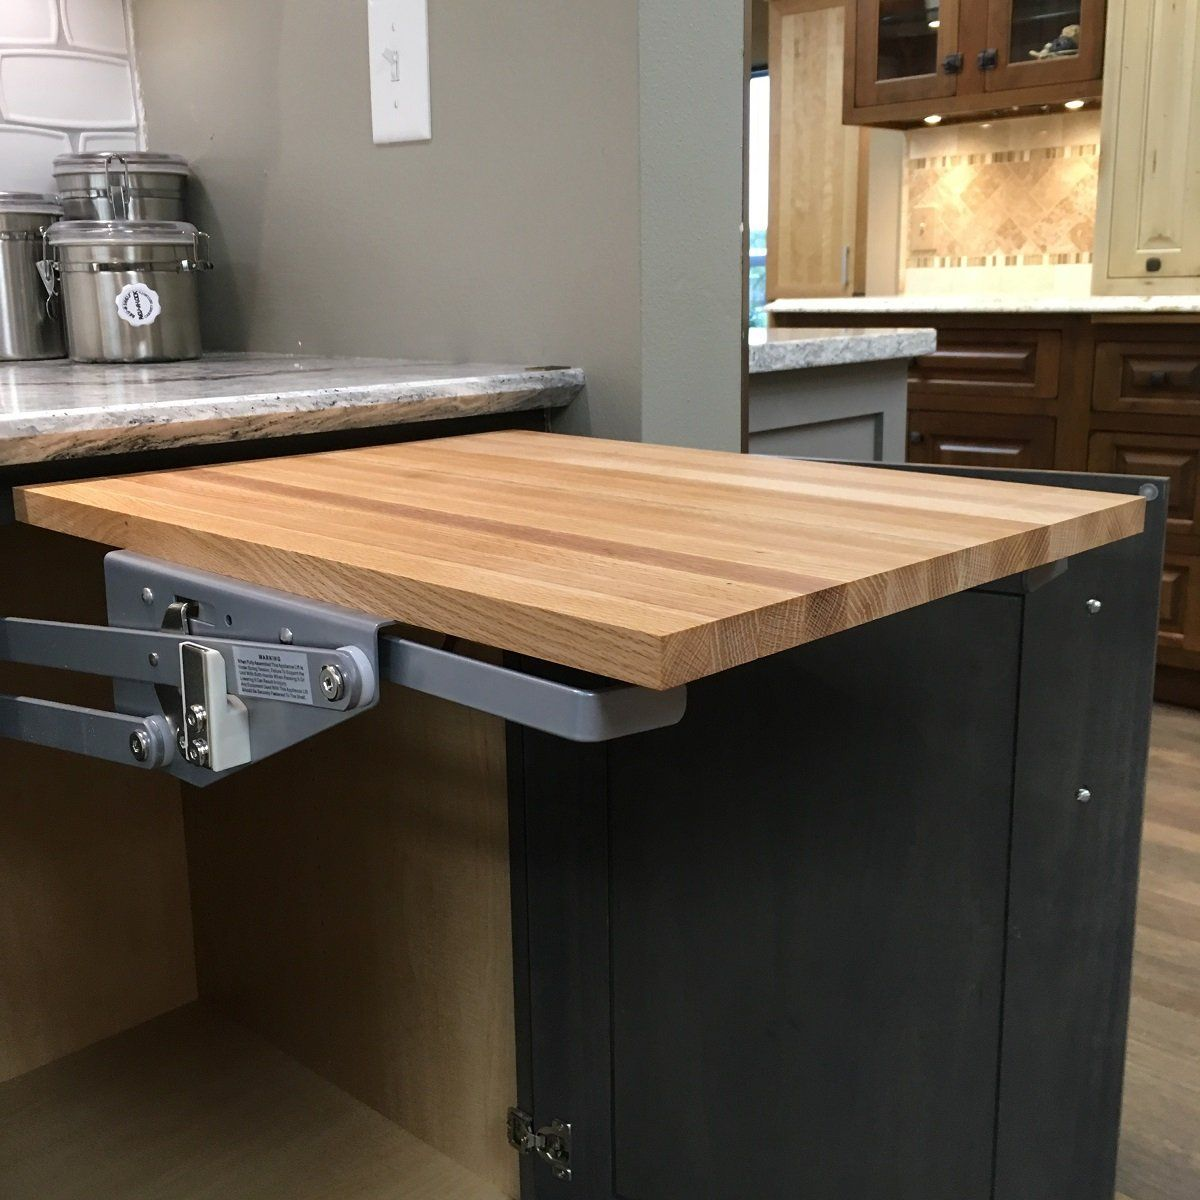 Wood Shelf Platform Only 3 4 X 15 X 19 For Revashelf Rasmlhdcr Heavy Duty Mixer Lift Red Oak Butcher Block Tr Wood Shelves Red Oak Small Kitchen Appliances